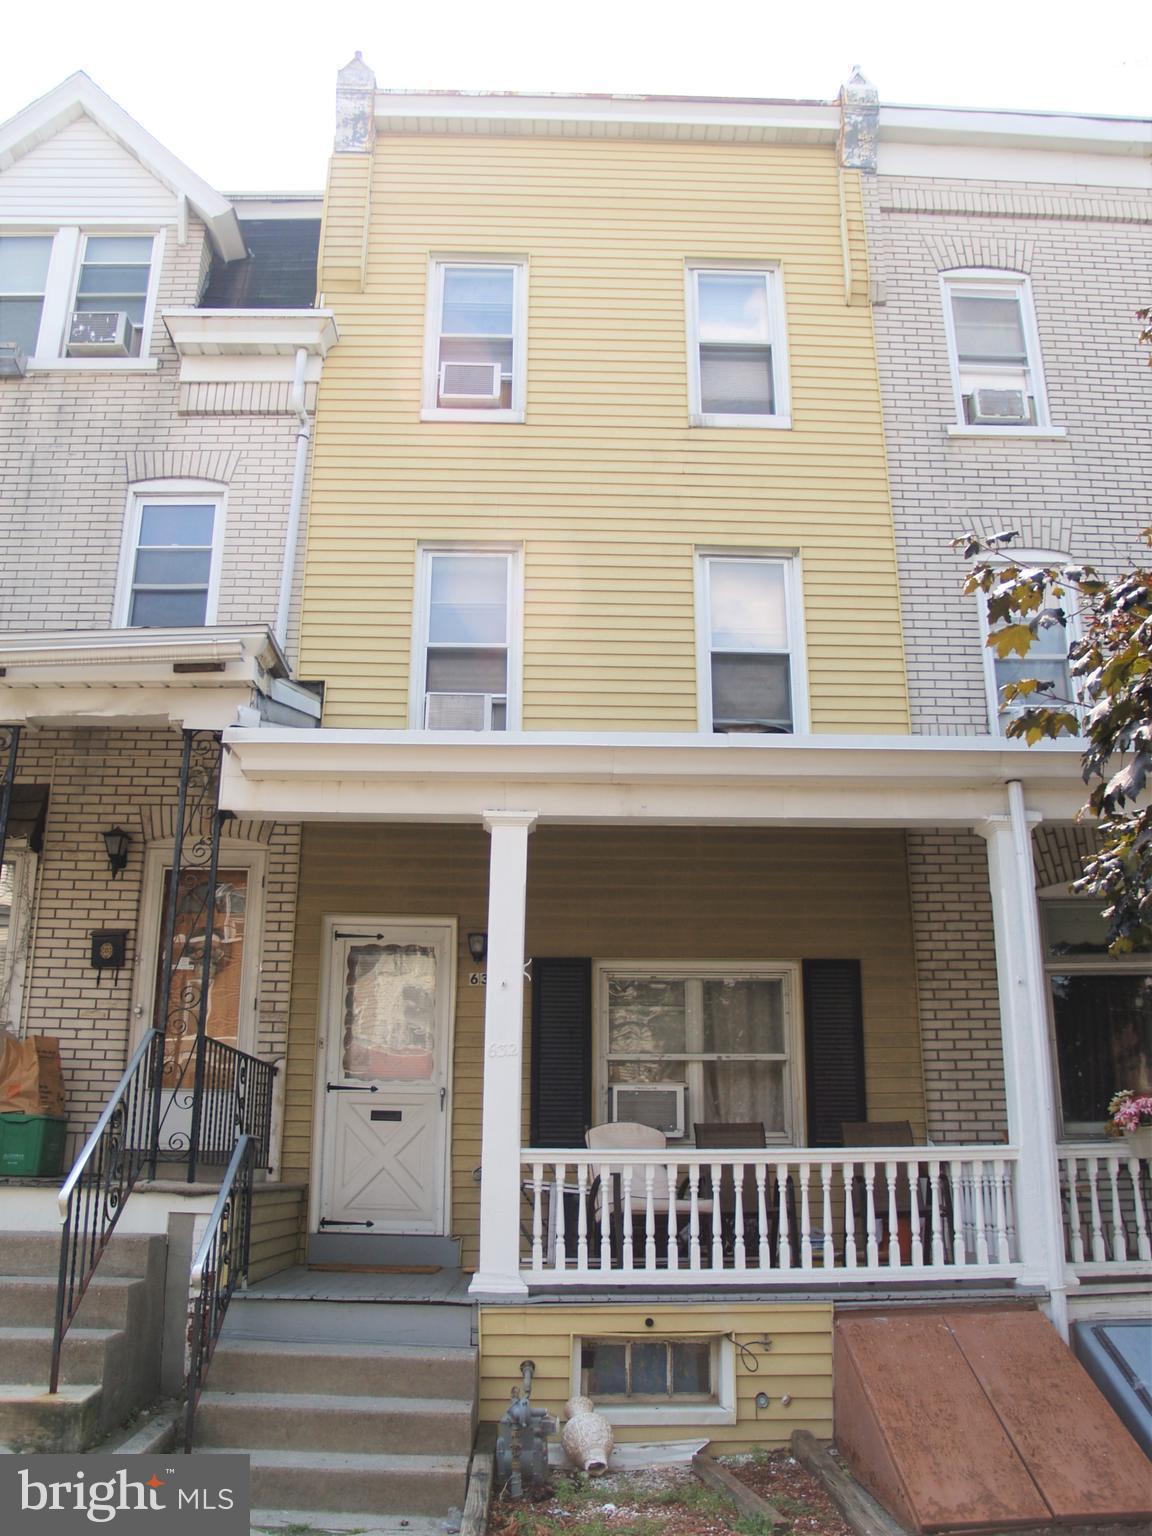 632 N 16TH STREET, ALLENTOWN, PA 18102